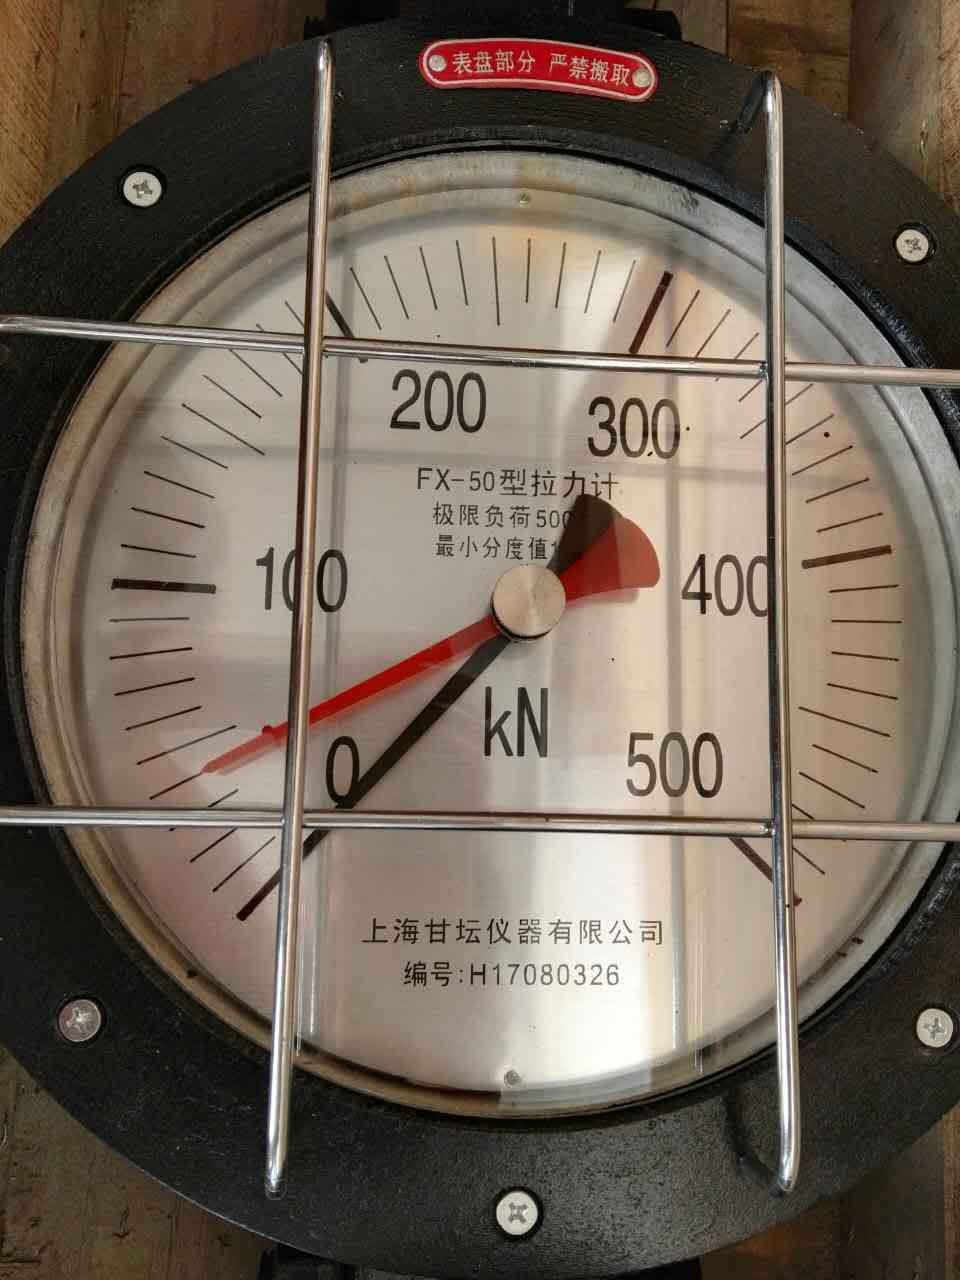 1Kg-50t机械式拉力计 专卖价格_铁路用拉力表